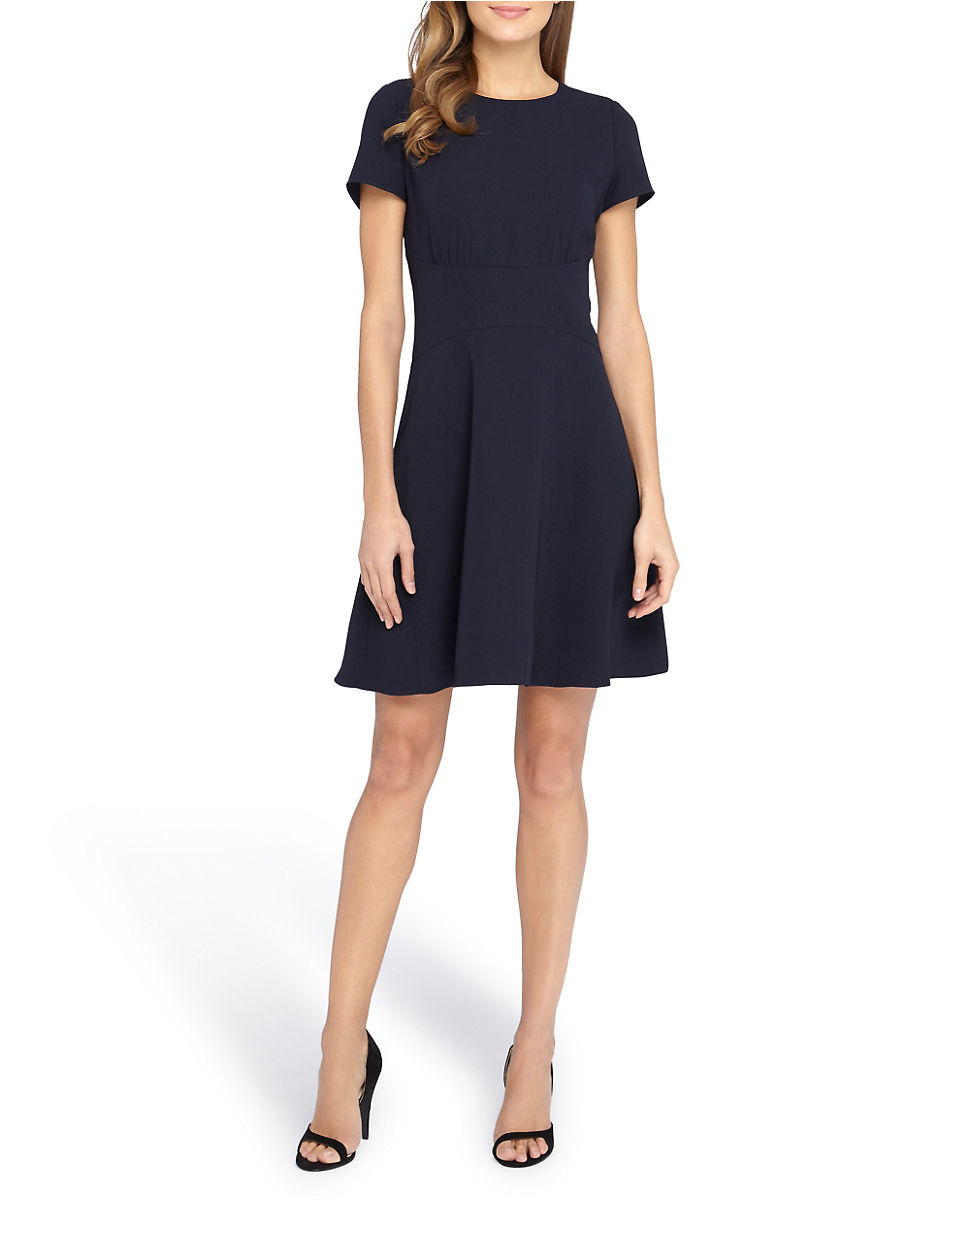 Tahari Petite Short Sleeve Fit And Flare Dress In Black Lyst